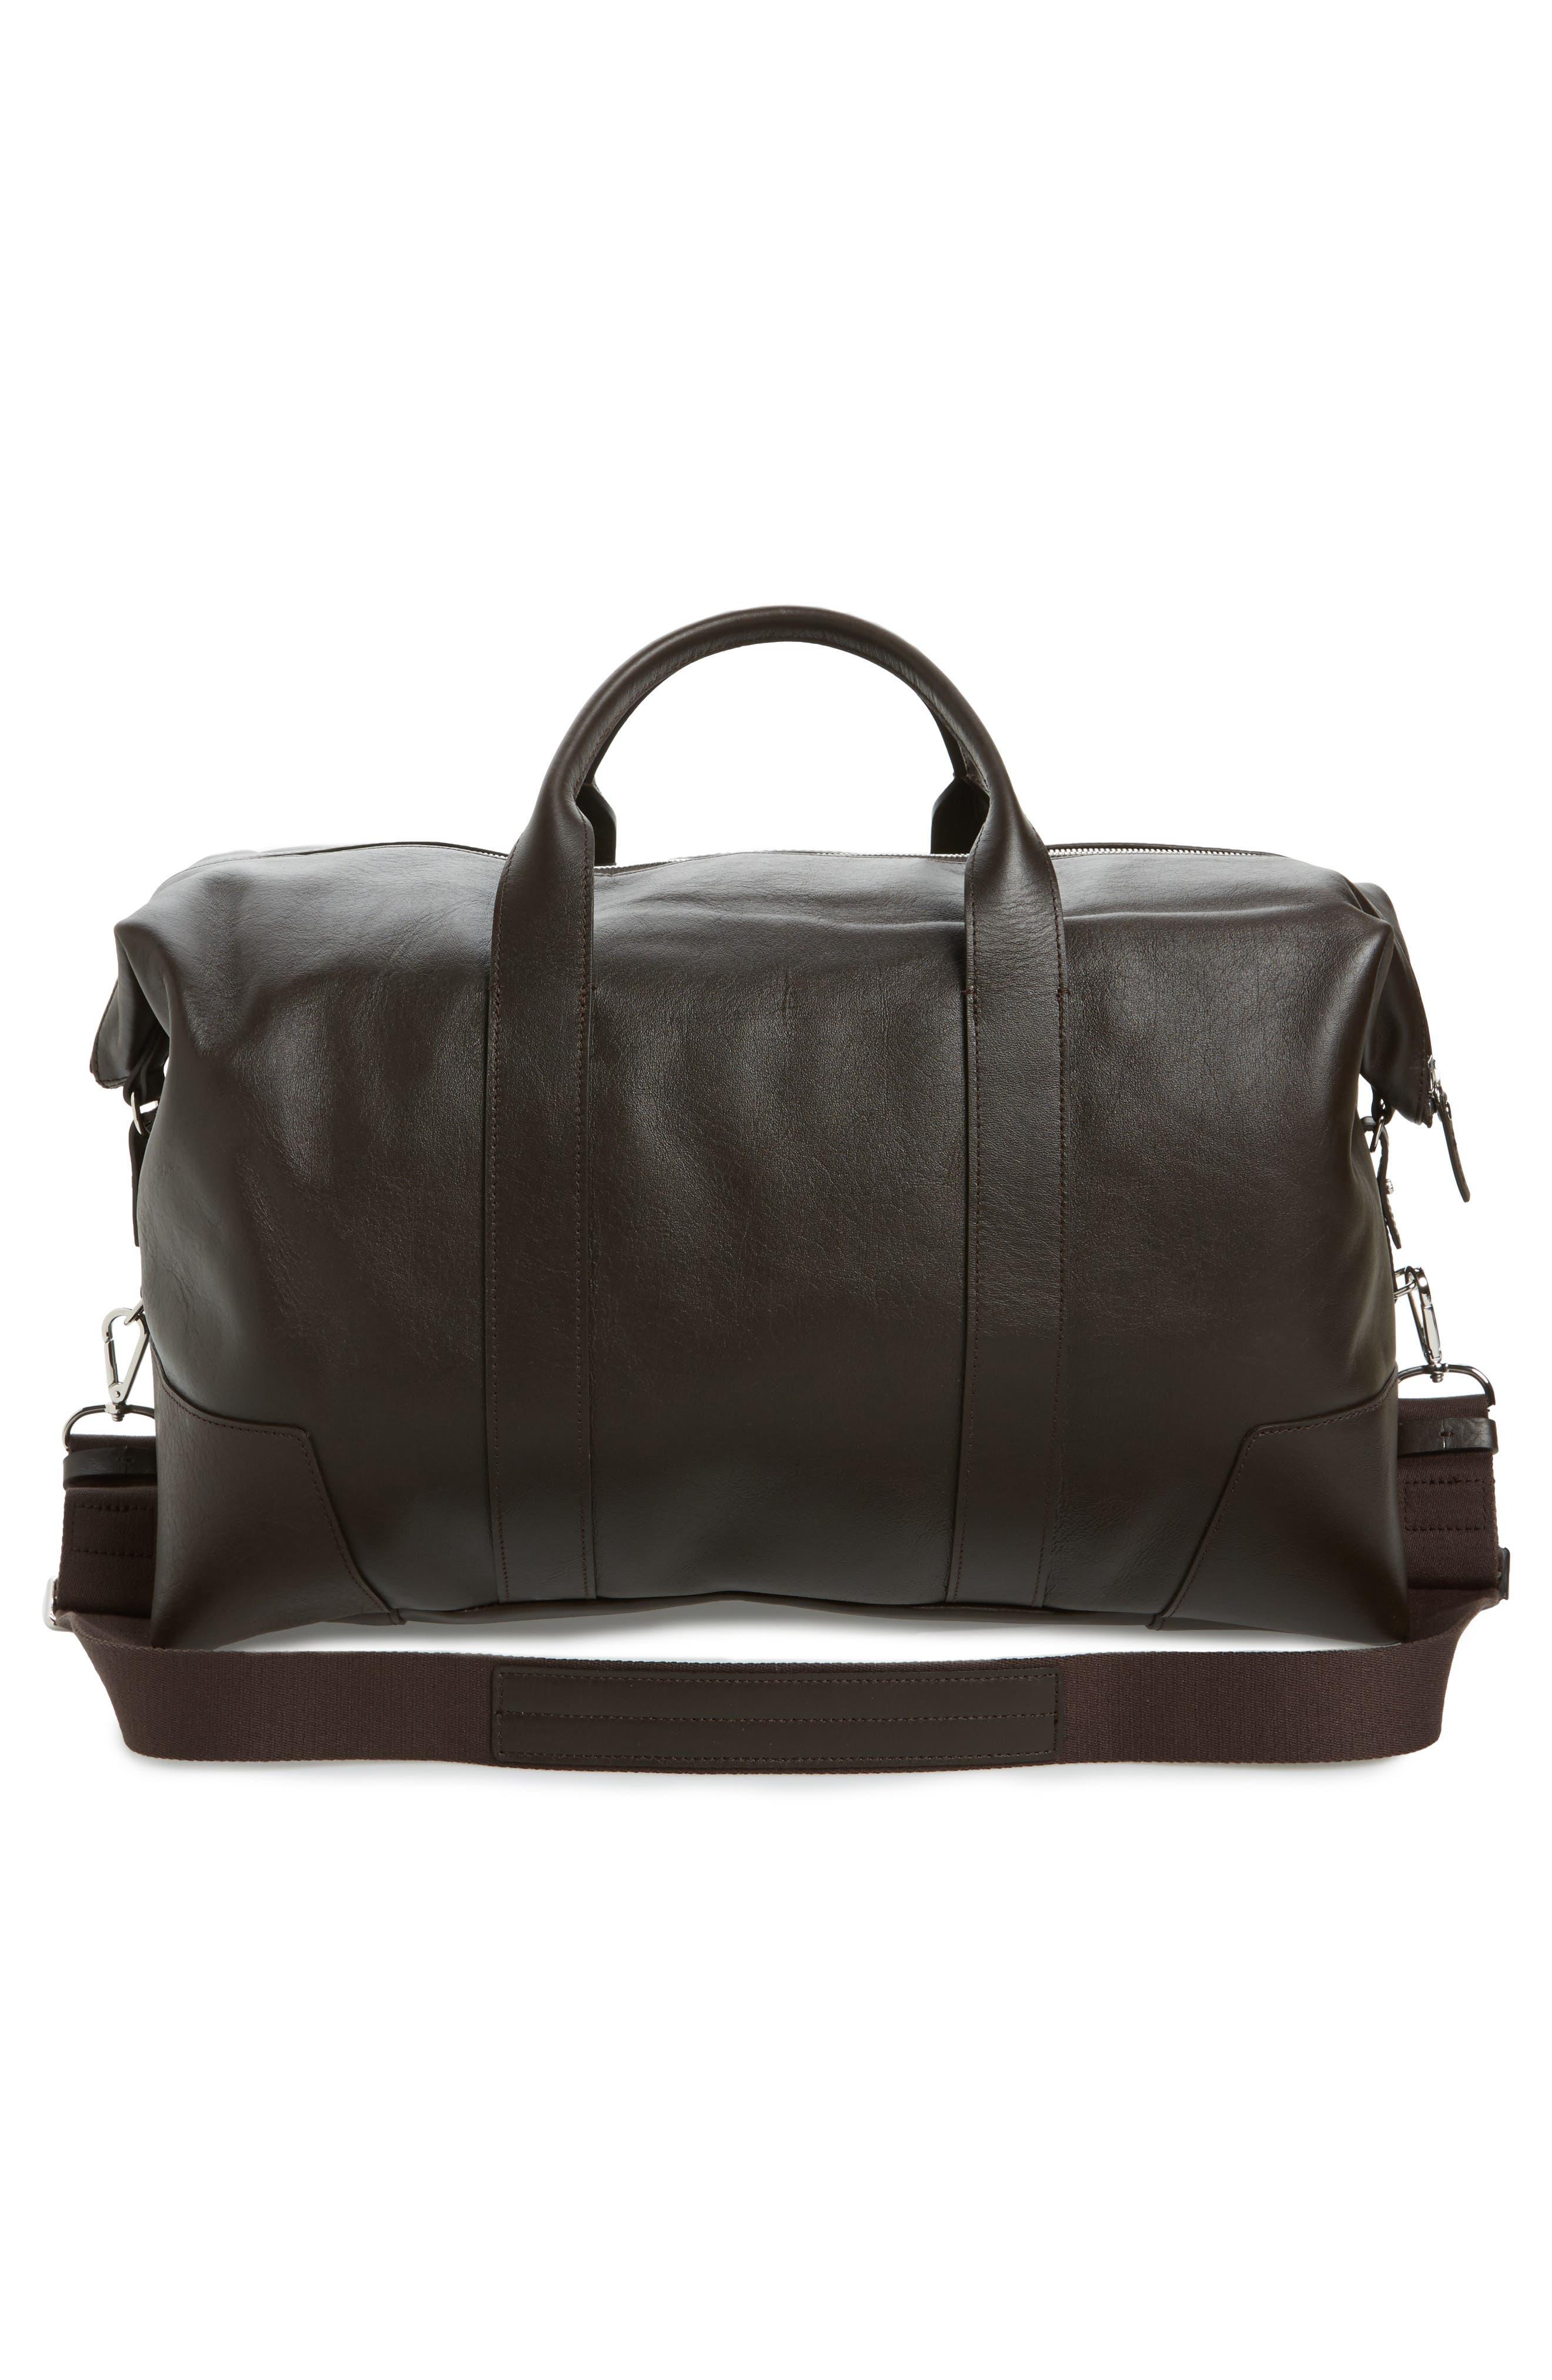 Signature Leather Duffel Bag,                             Alternate thumbnail 3, color,                             DEEP BROWN